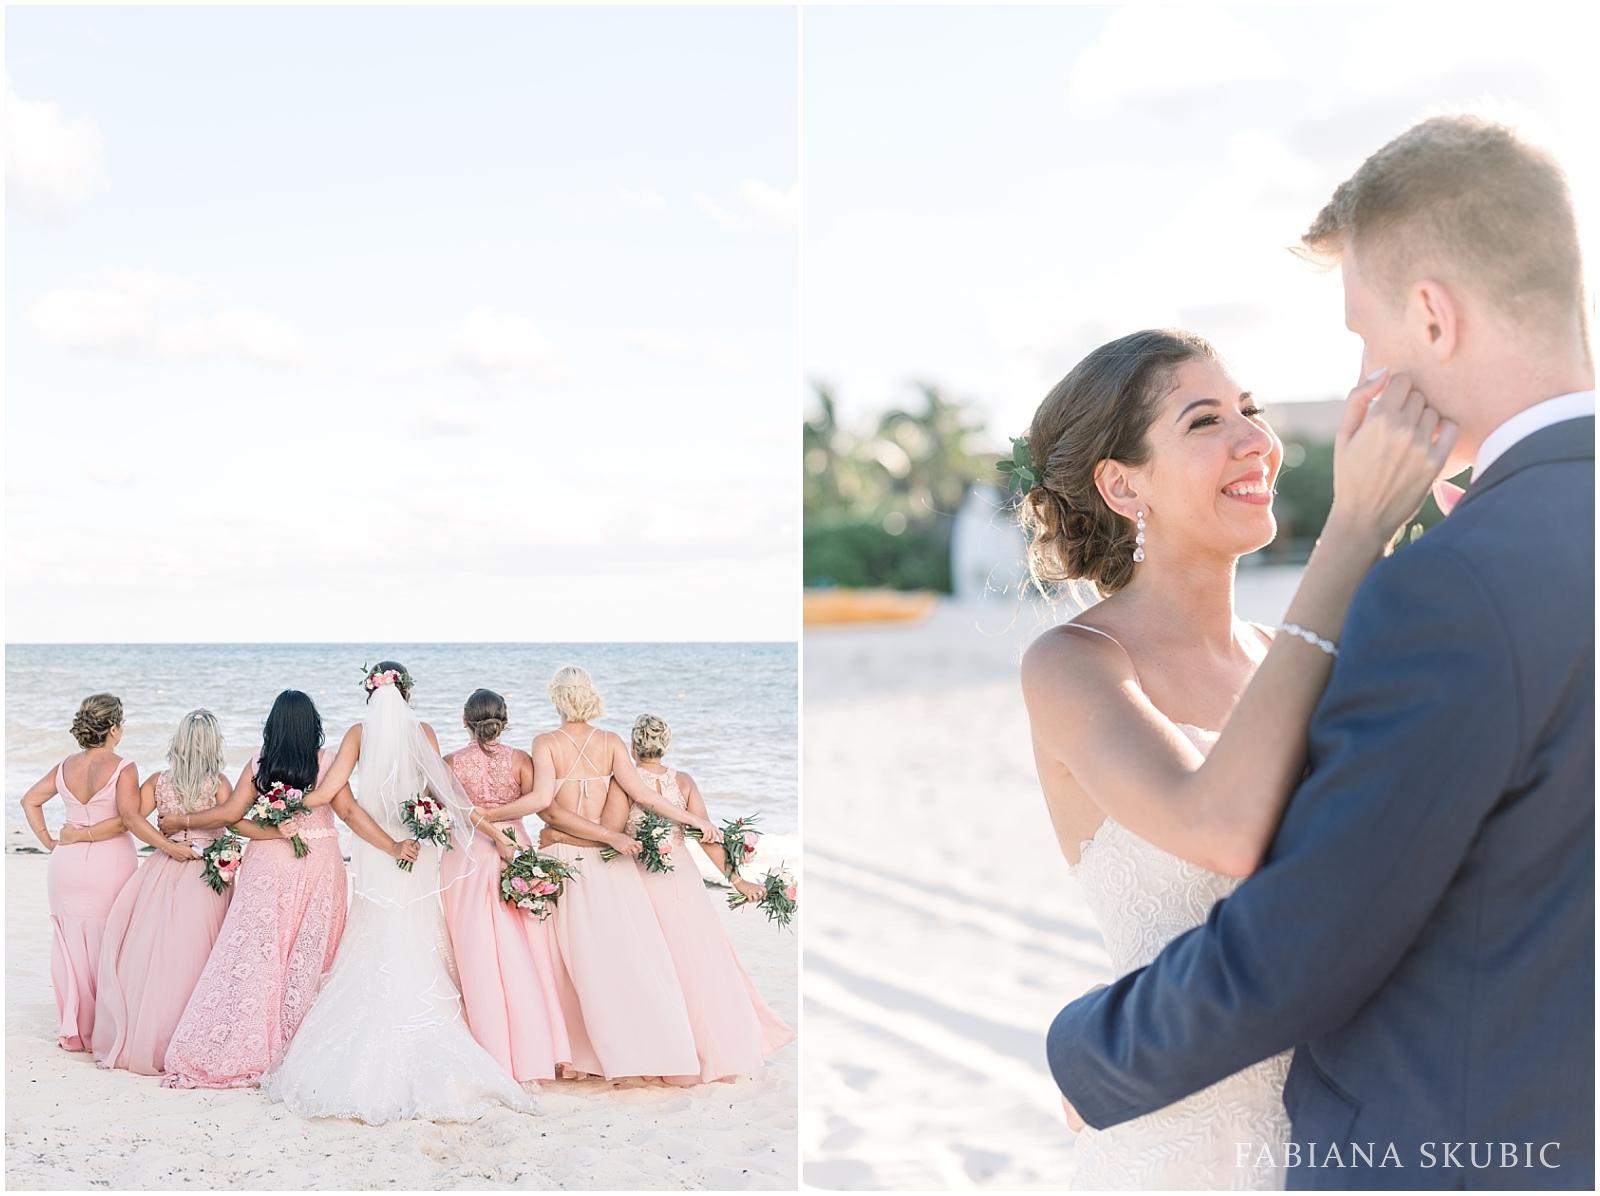 TJ_Now_Sapphire_Riviera_Cancun_Mexico_Wedding_Photos_0249.jpg